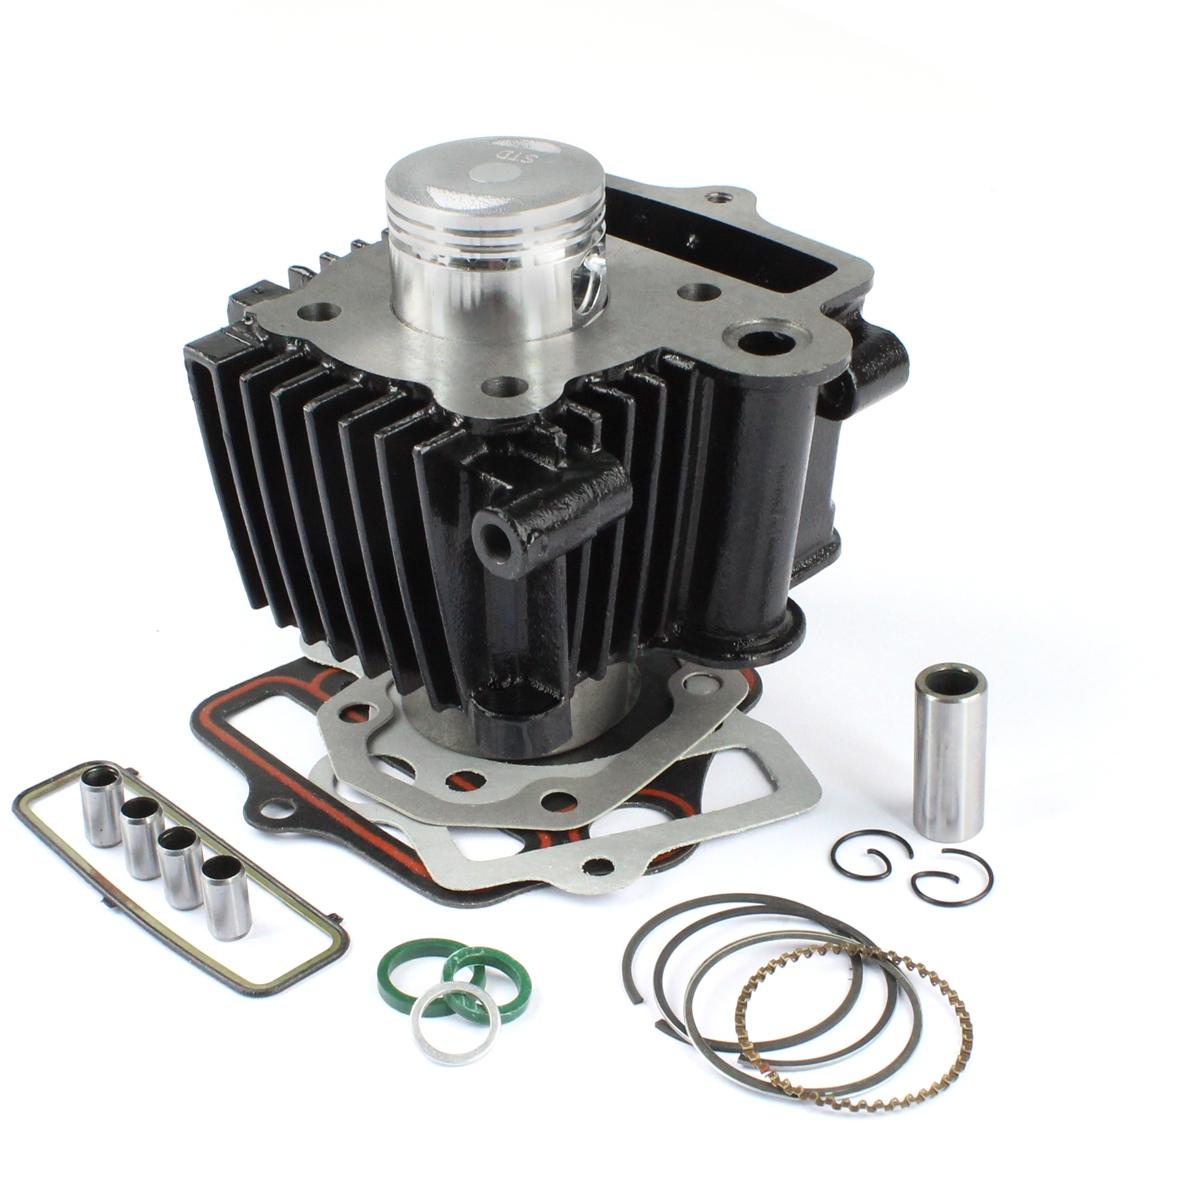 Cylindre TNT Fonte adaptable répliques Dax City/ Skyteam 50cc 4t(Moteu